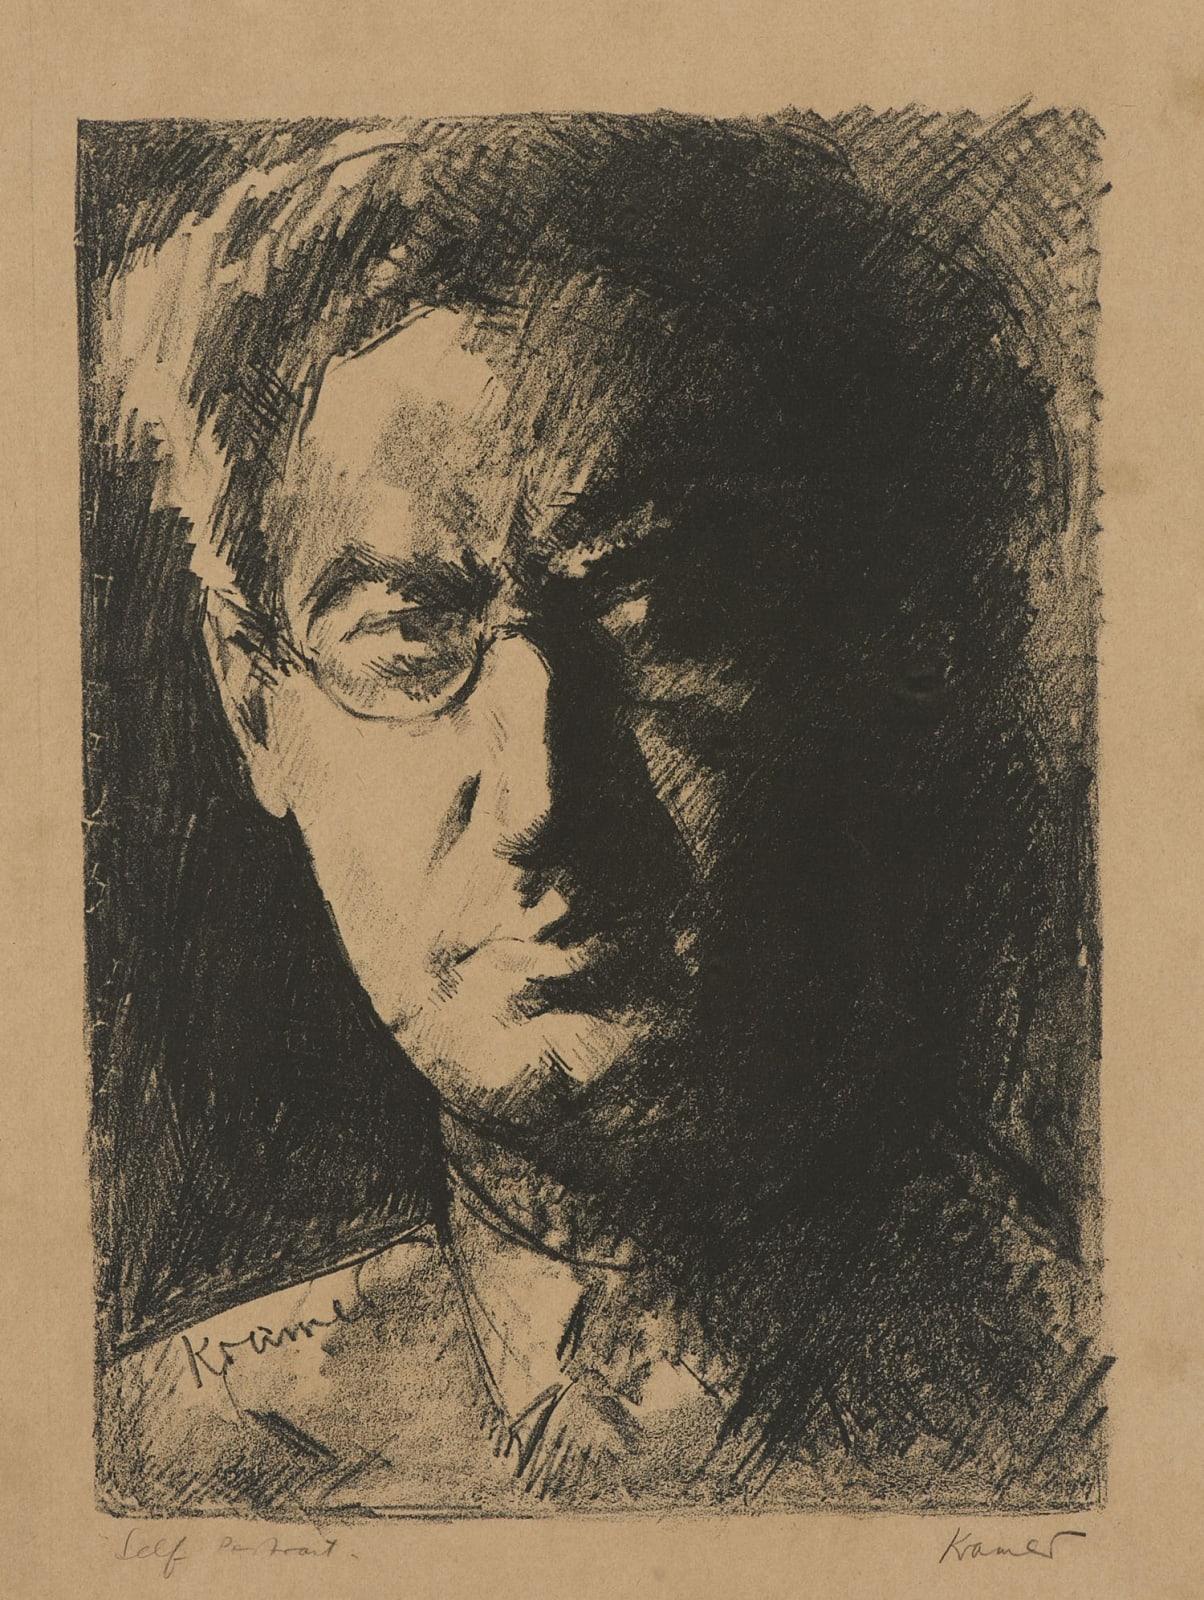 Jacob Kramer (1892-1962) Self Portrait n.d. Lithograph on paper 44.6 x 33.3 cm Ben Uri Collection © Jacob Kramer estate